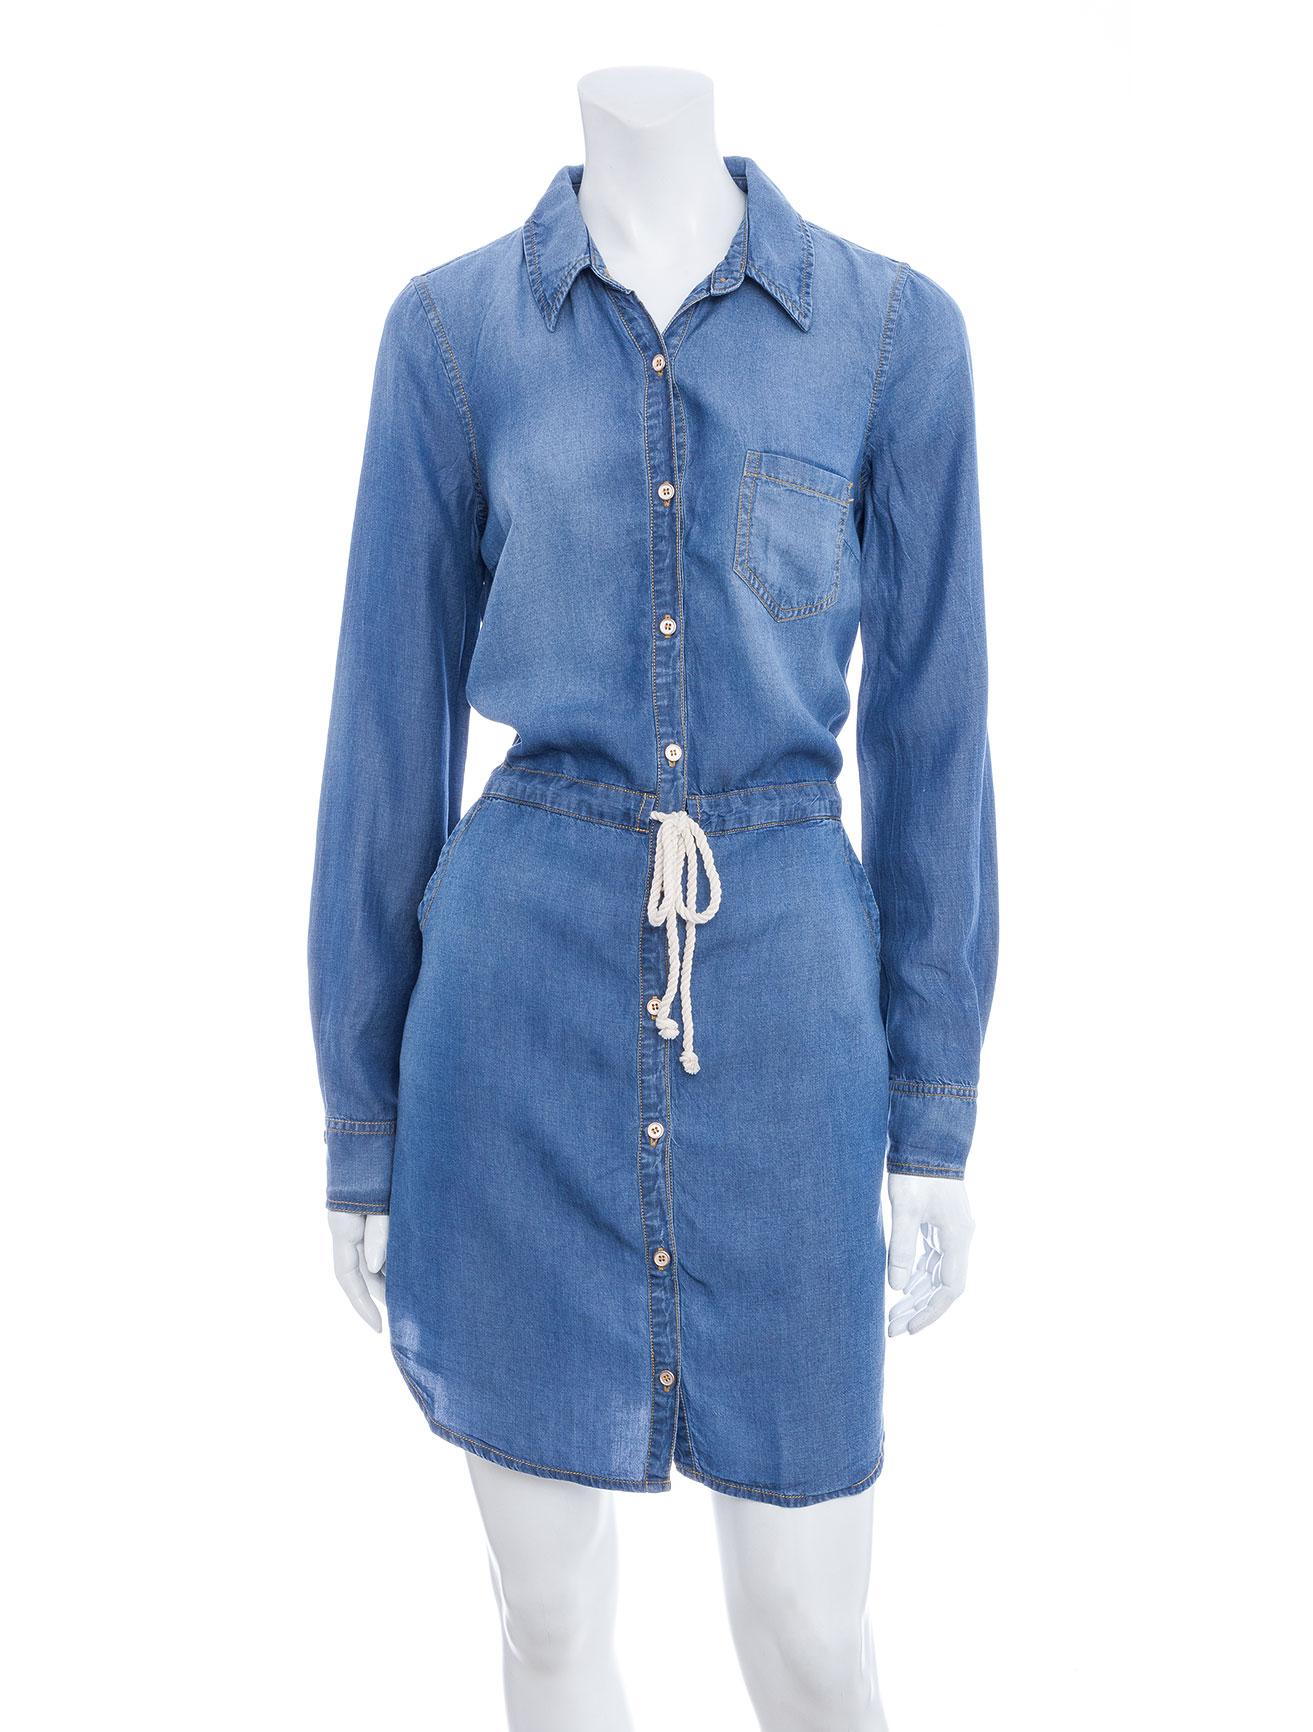 Splendid chambray shirtdress in blue denim lyst for Chambray jeans